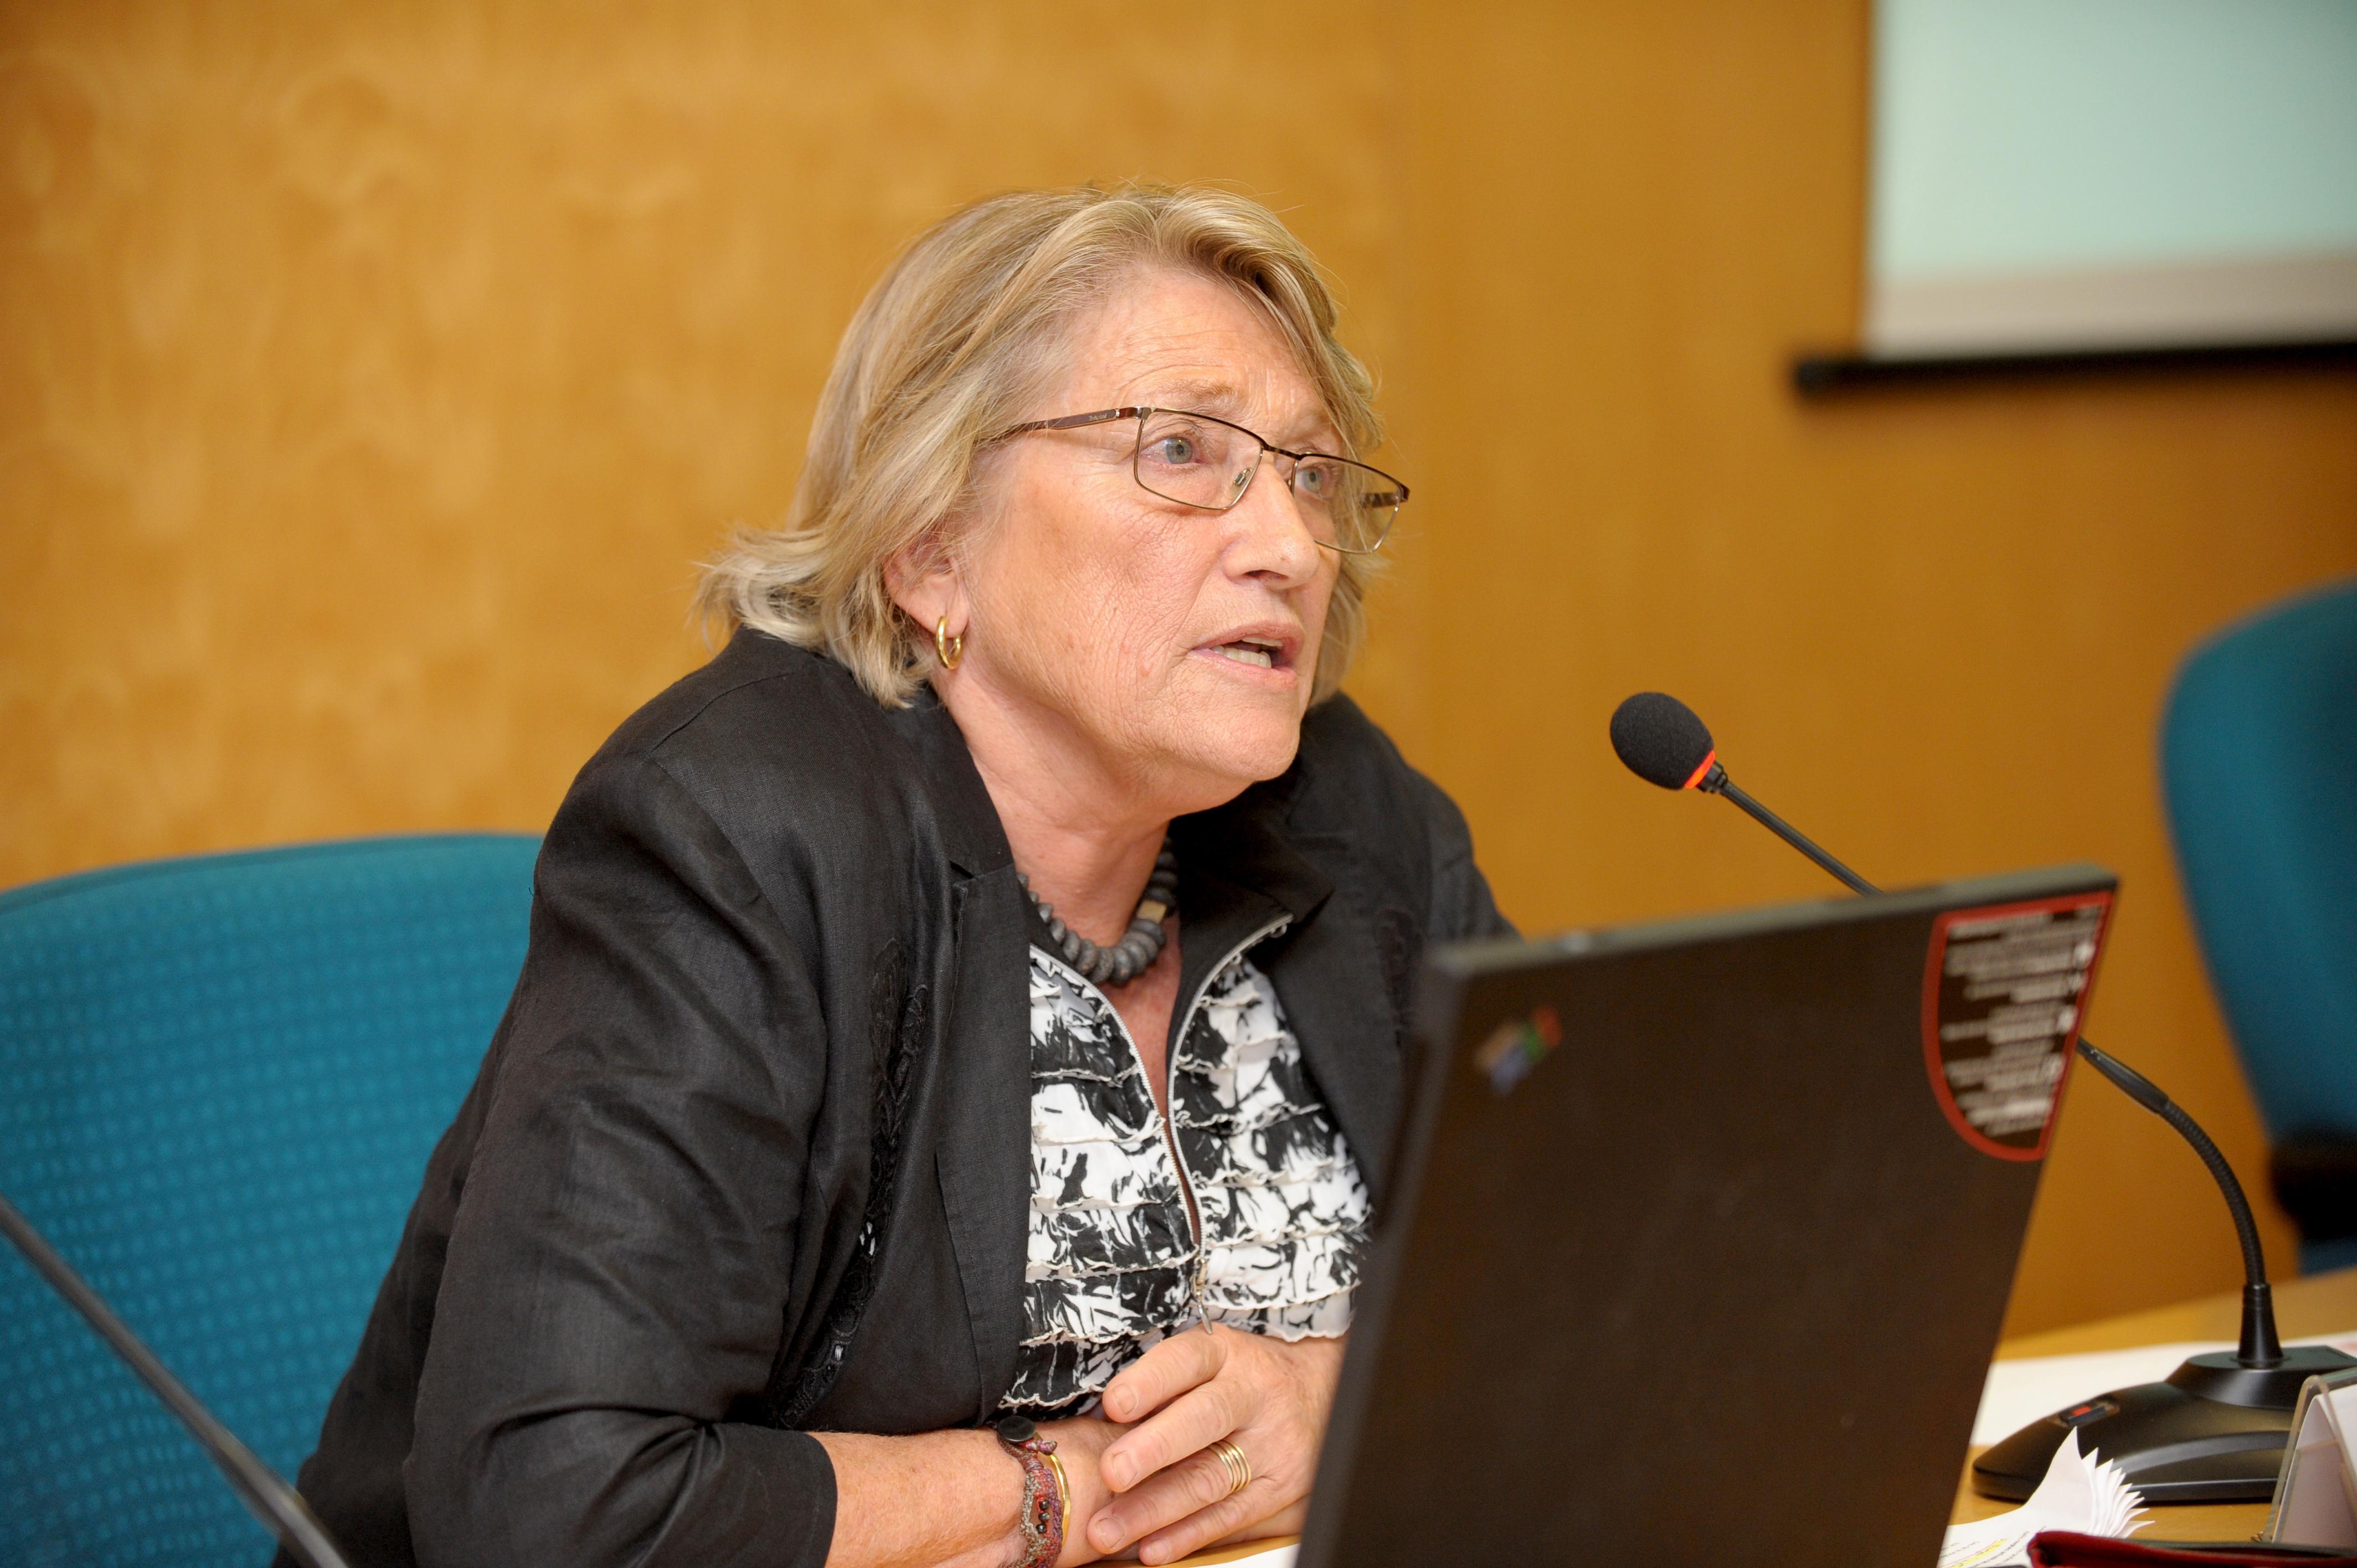 Teresa Crespo